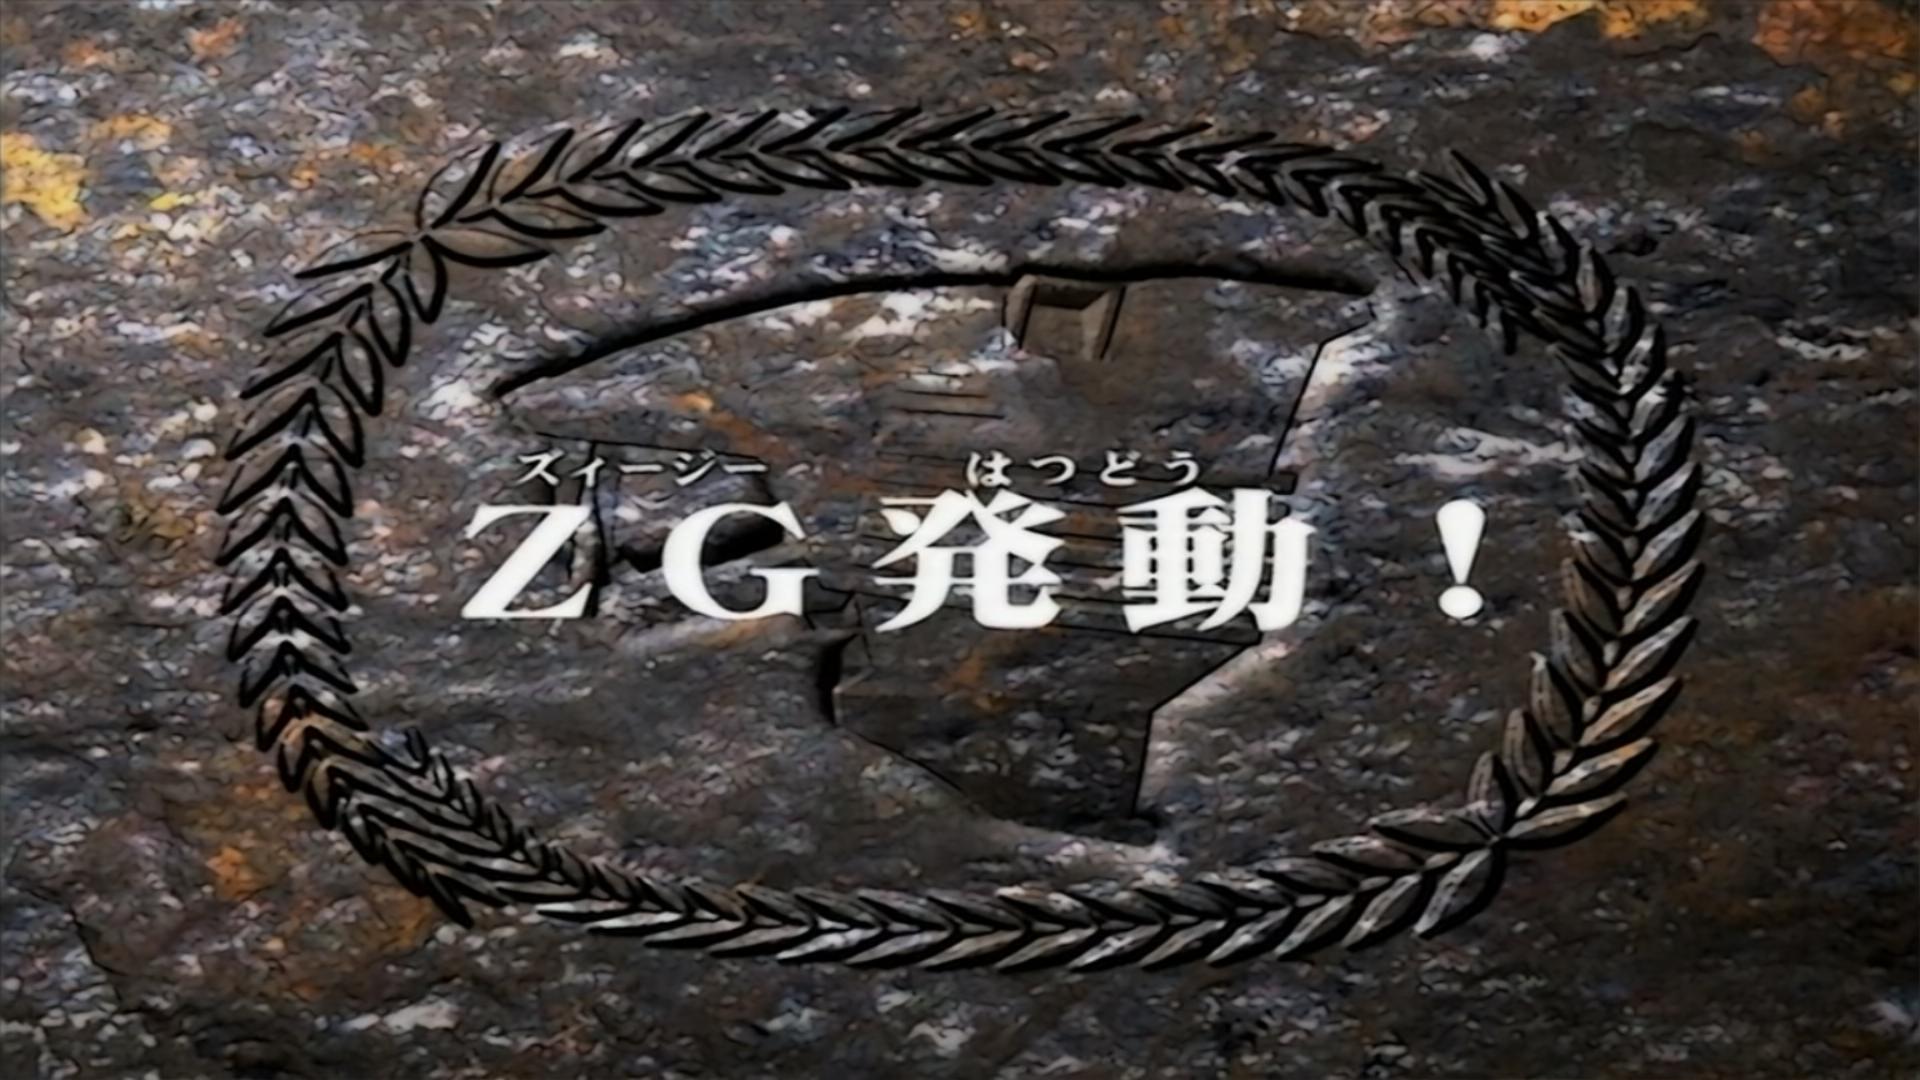 Zoids: Chaotic Century Episode 15